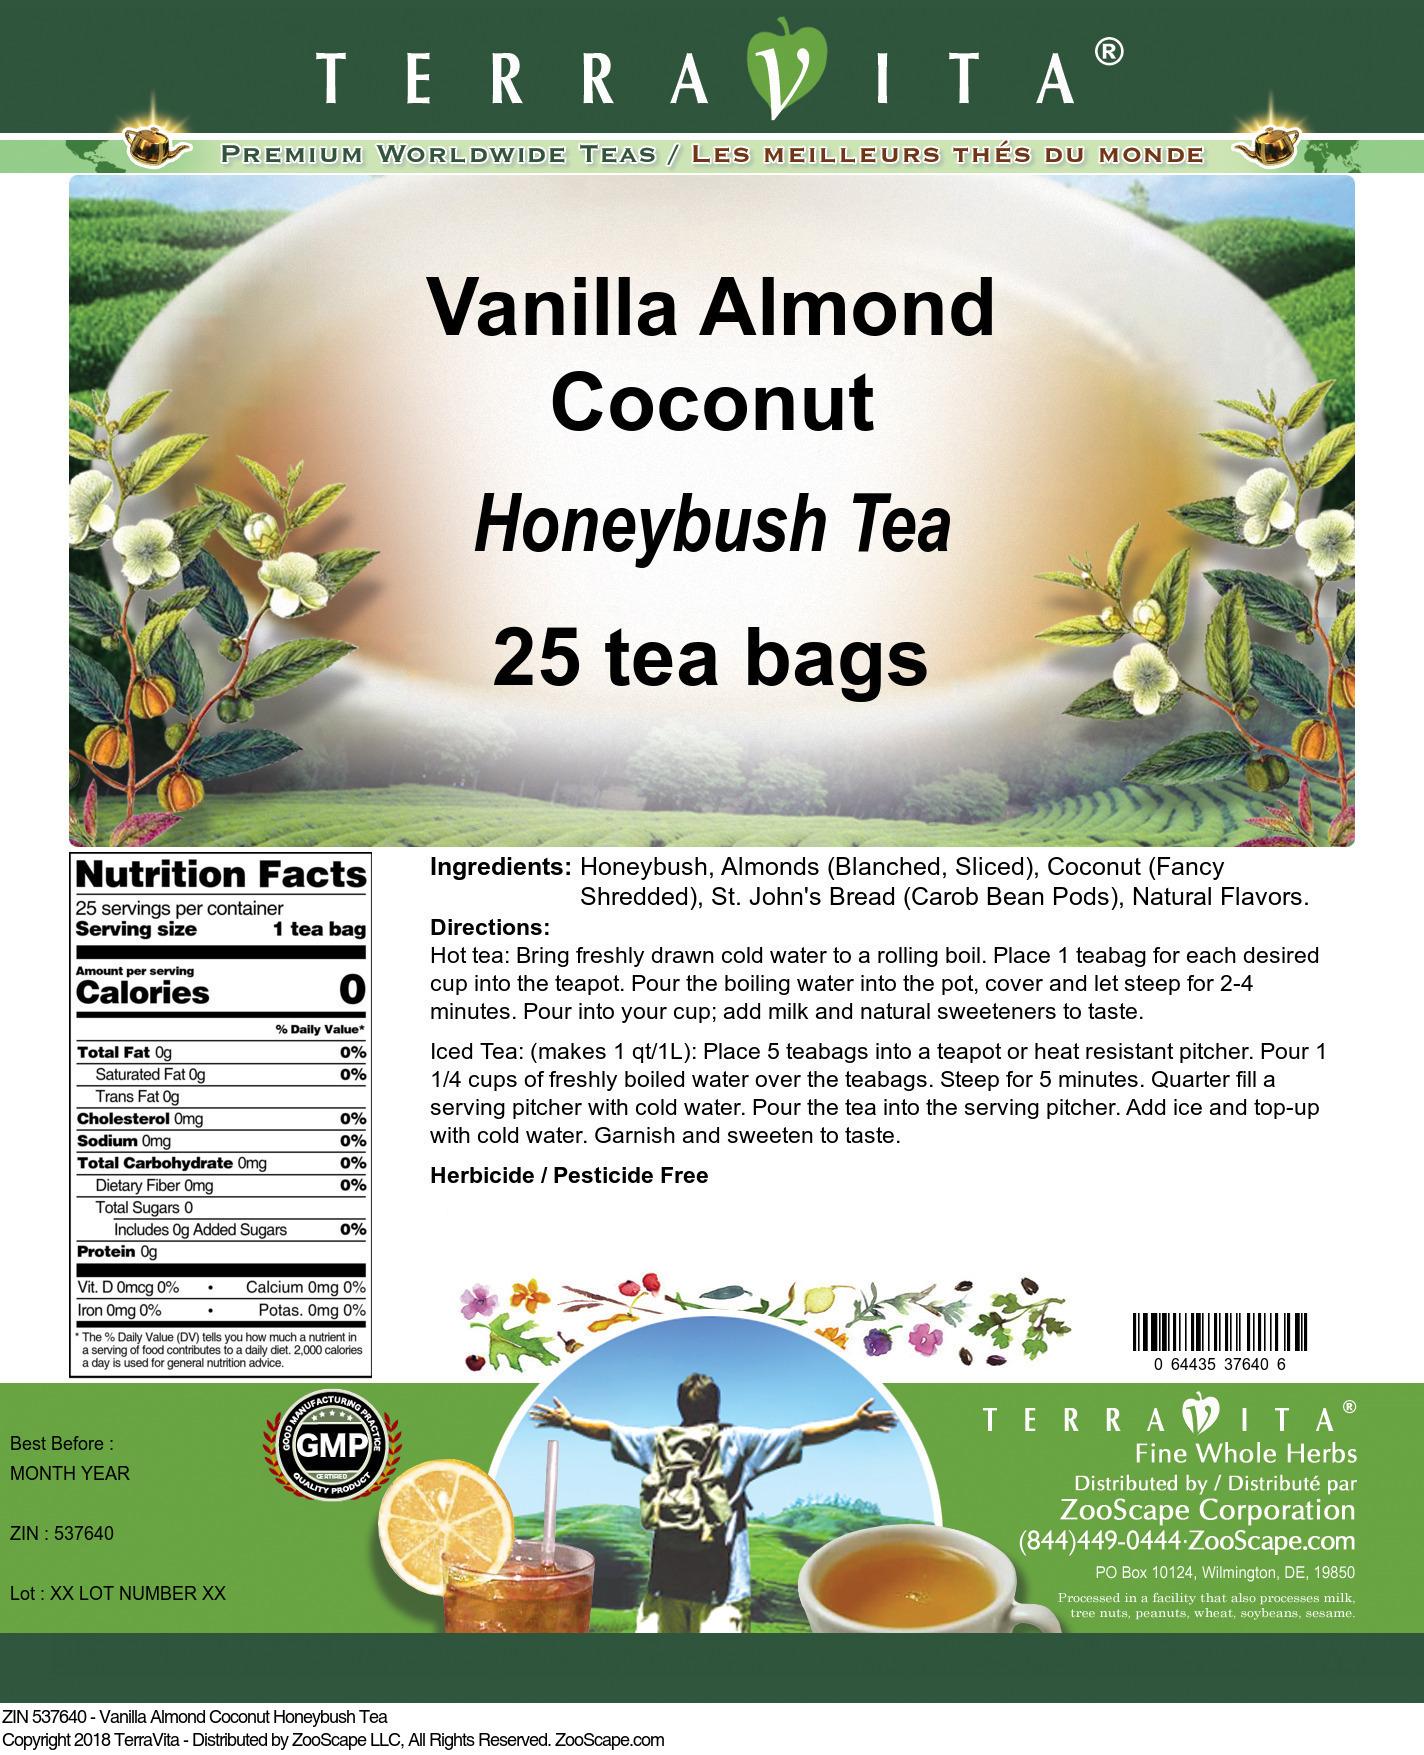 Vanilla Almond Coconut Honeybush Tea